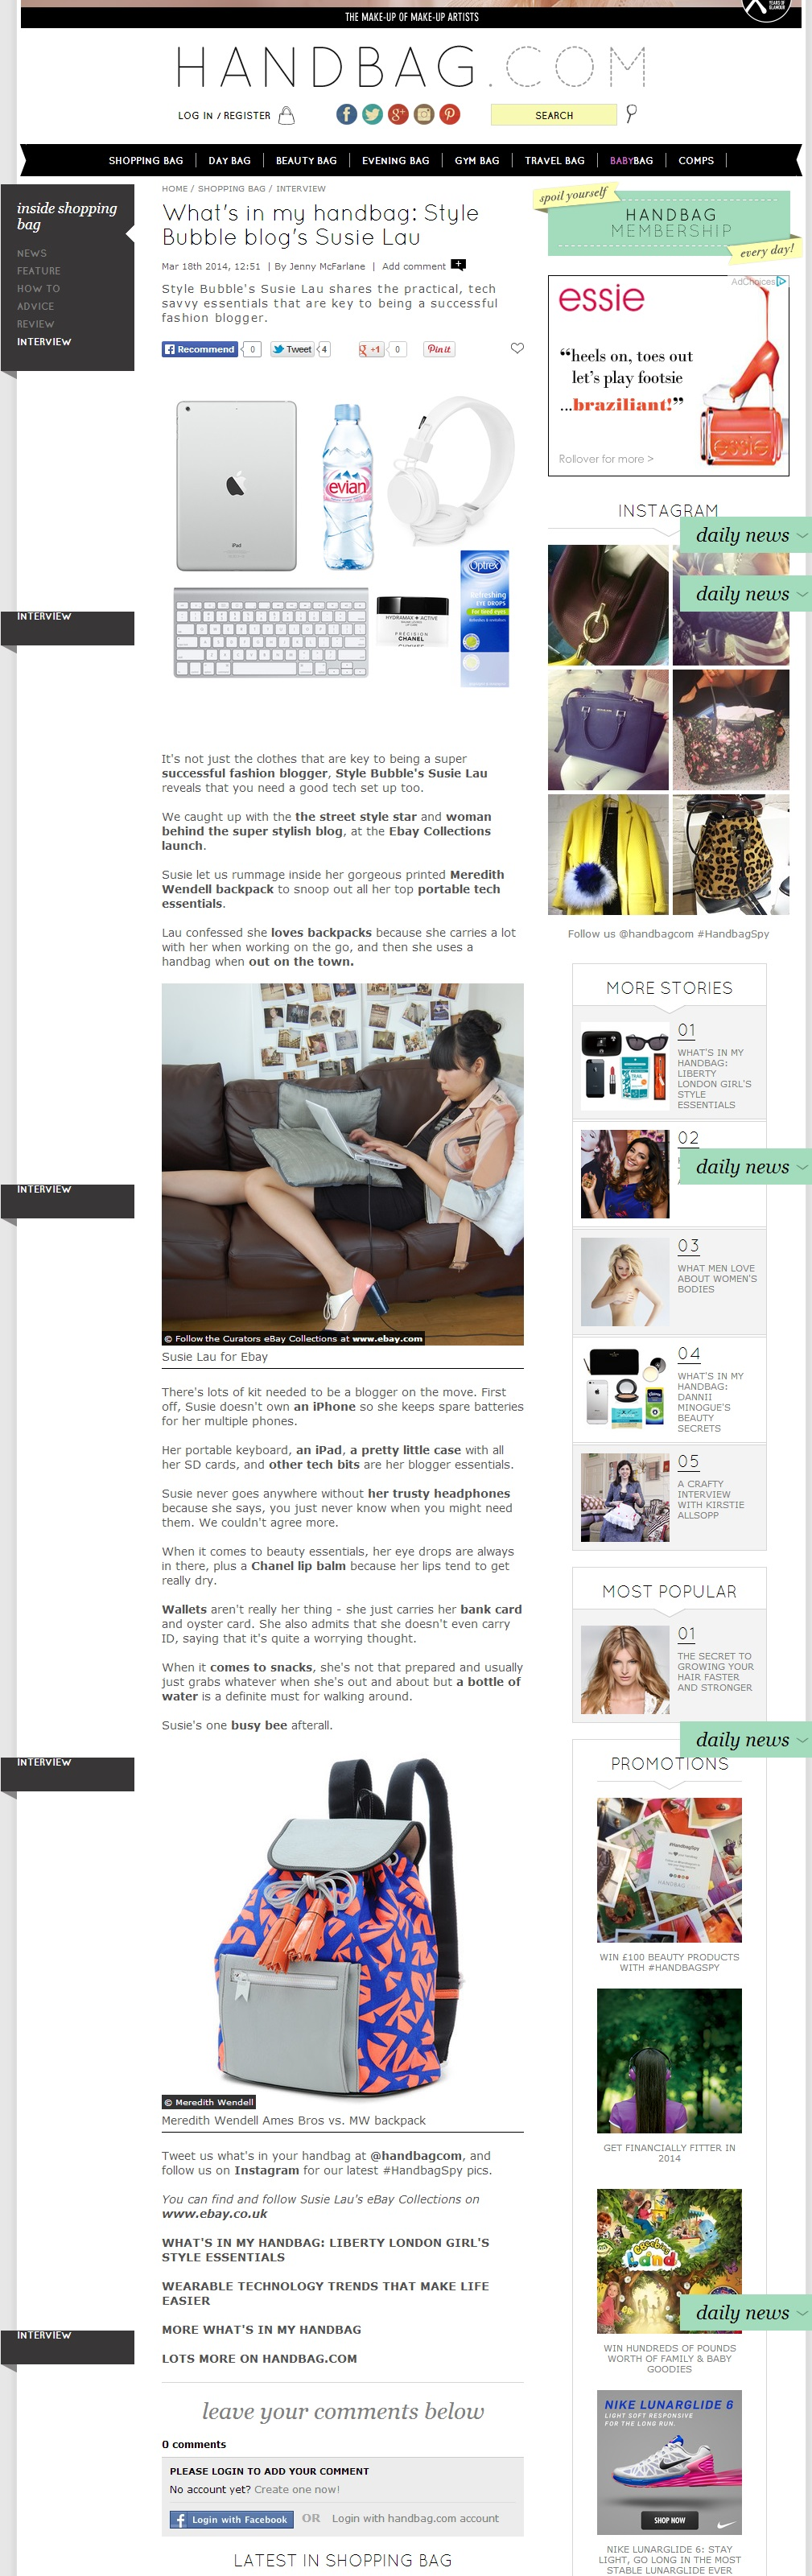 screencapture-www-handbag-com-shopping-bag-interviews-a557418-whats-in-my-handbag-style-bubble-blogs-susie-lau-html